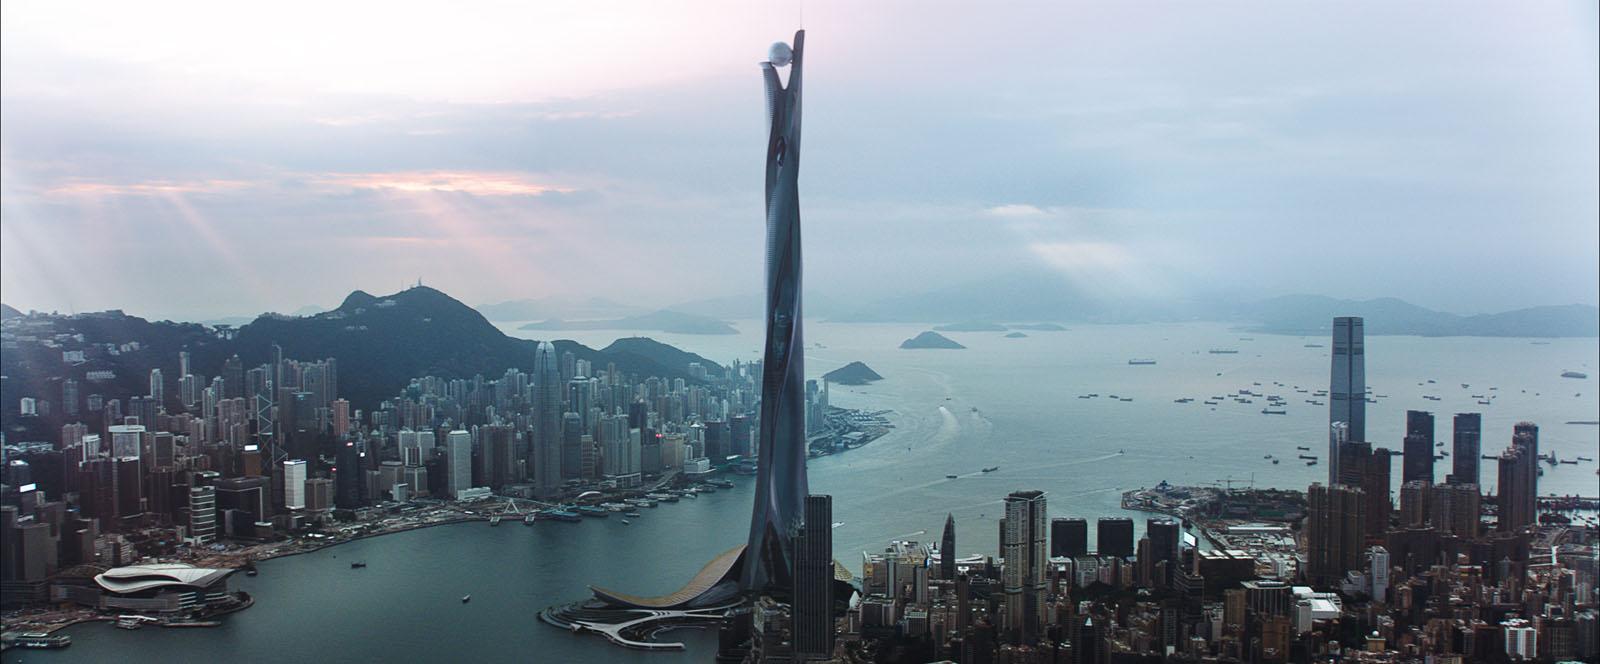 skyscraper-4.jpg